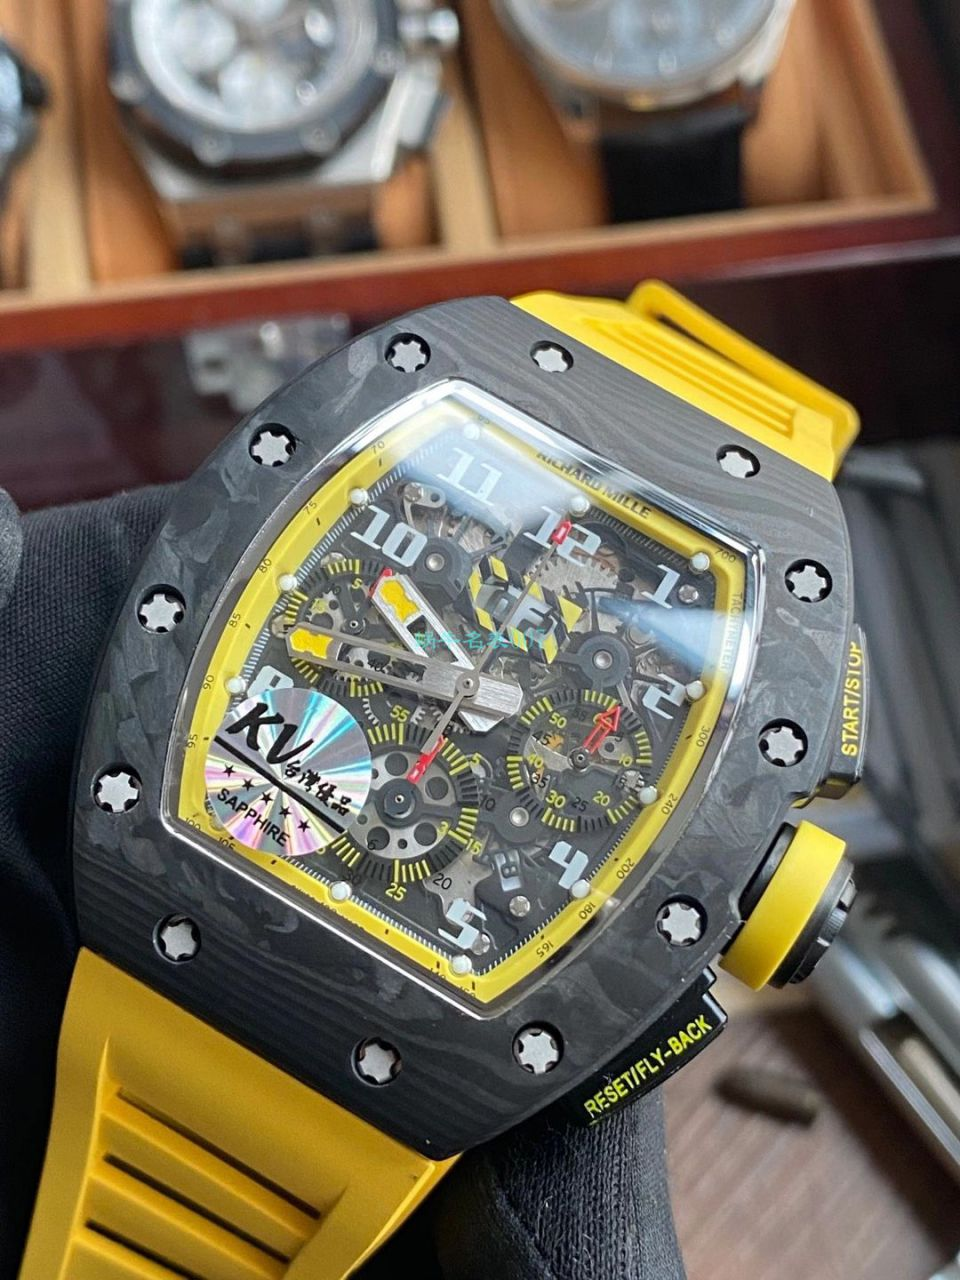 KV厂理查德米勒RM011 Yellow Storm黄色风暴一比一复刻手表 / KVRM011Yellow Storm